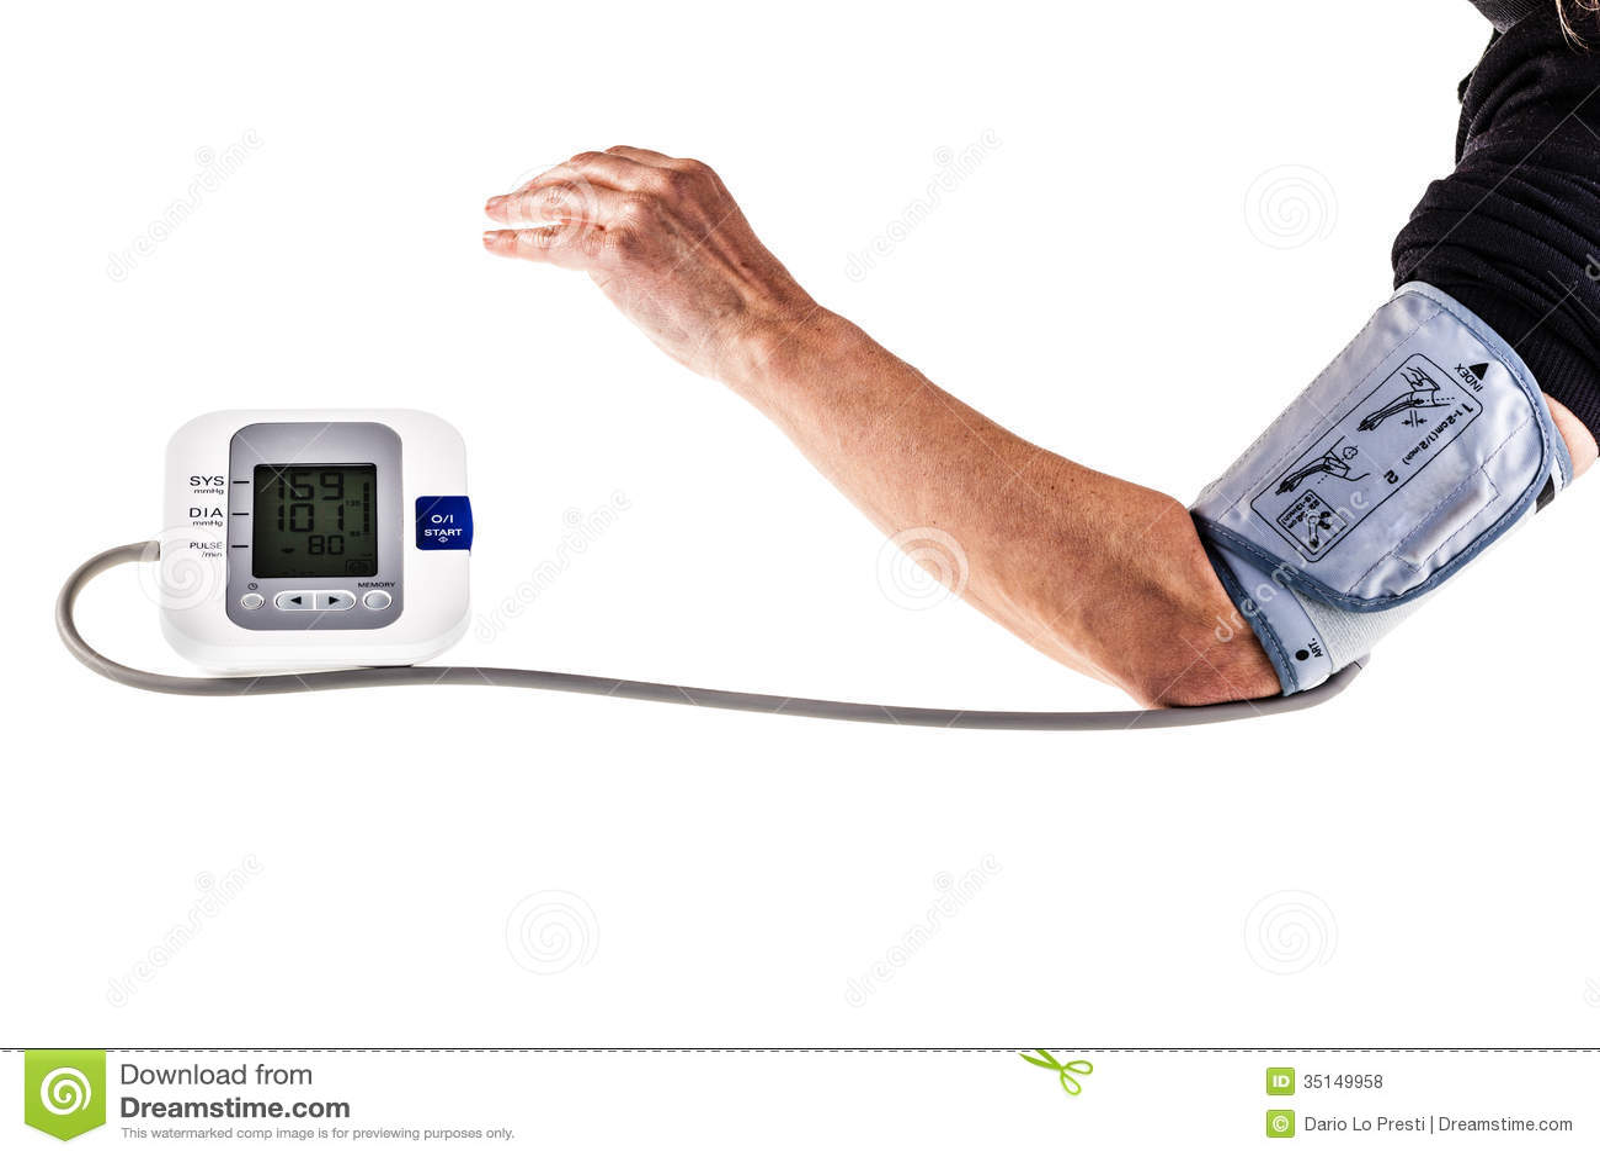 how to use sphygmomanometer video